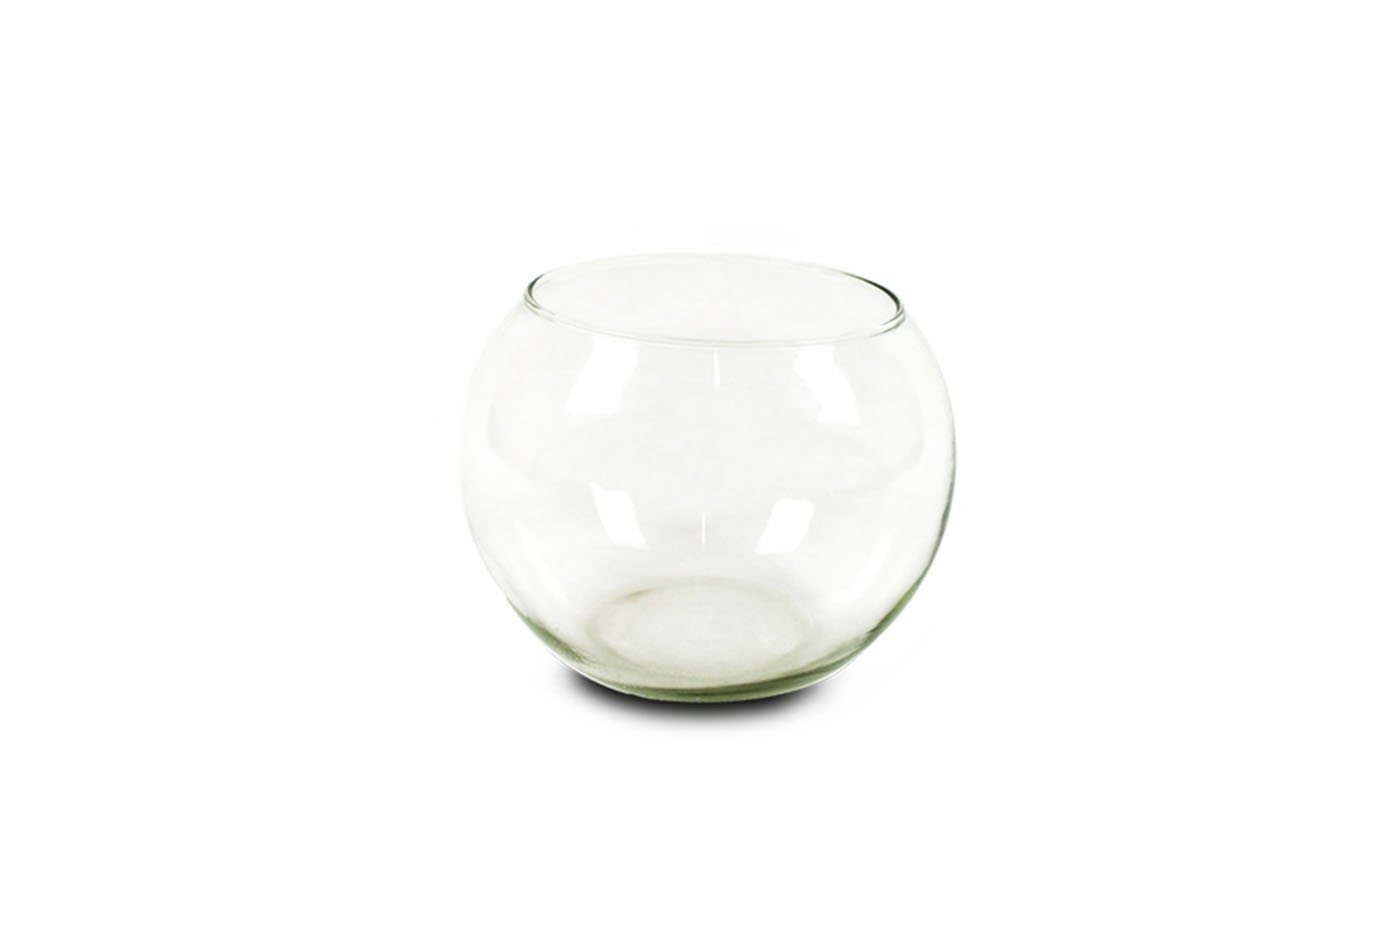 Bes 25504 acquariologia beselettronica mini acquario vetro con